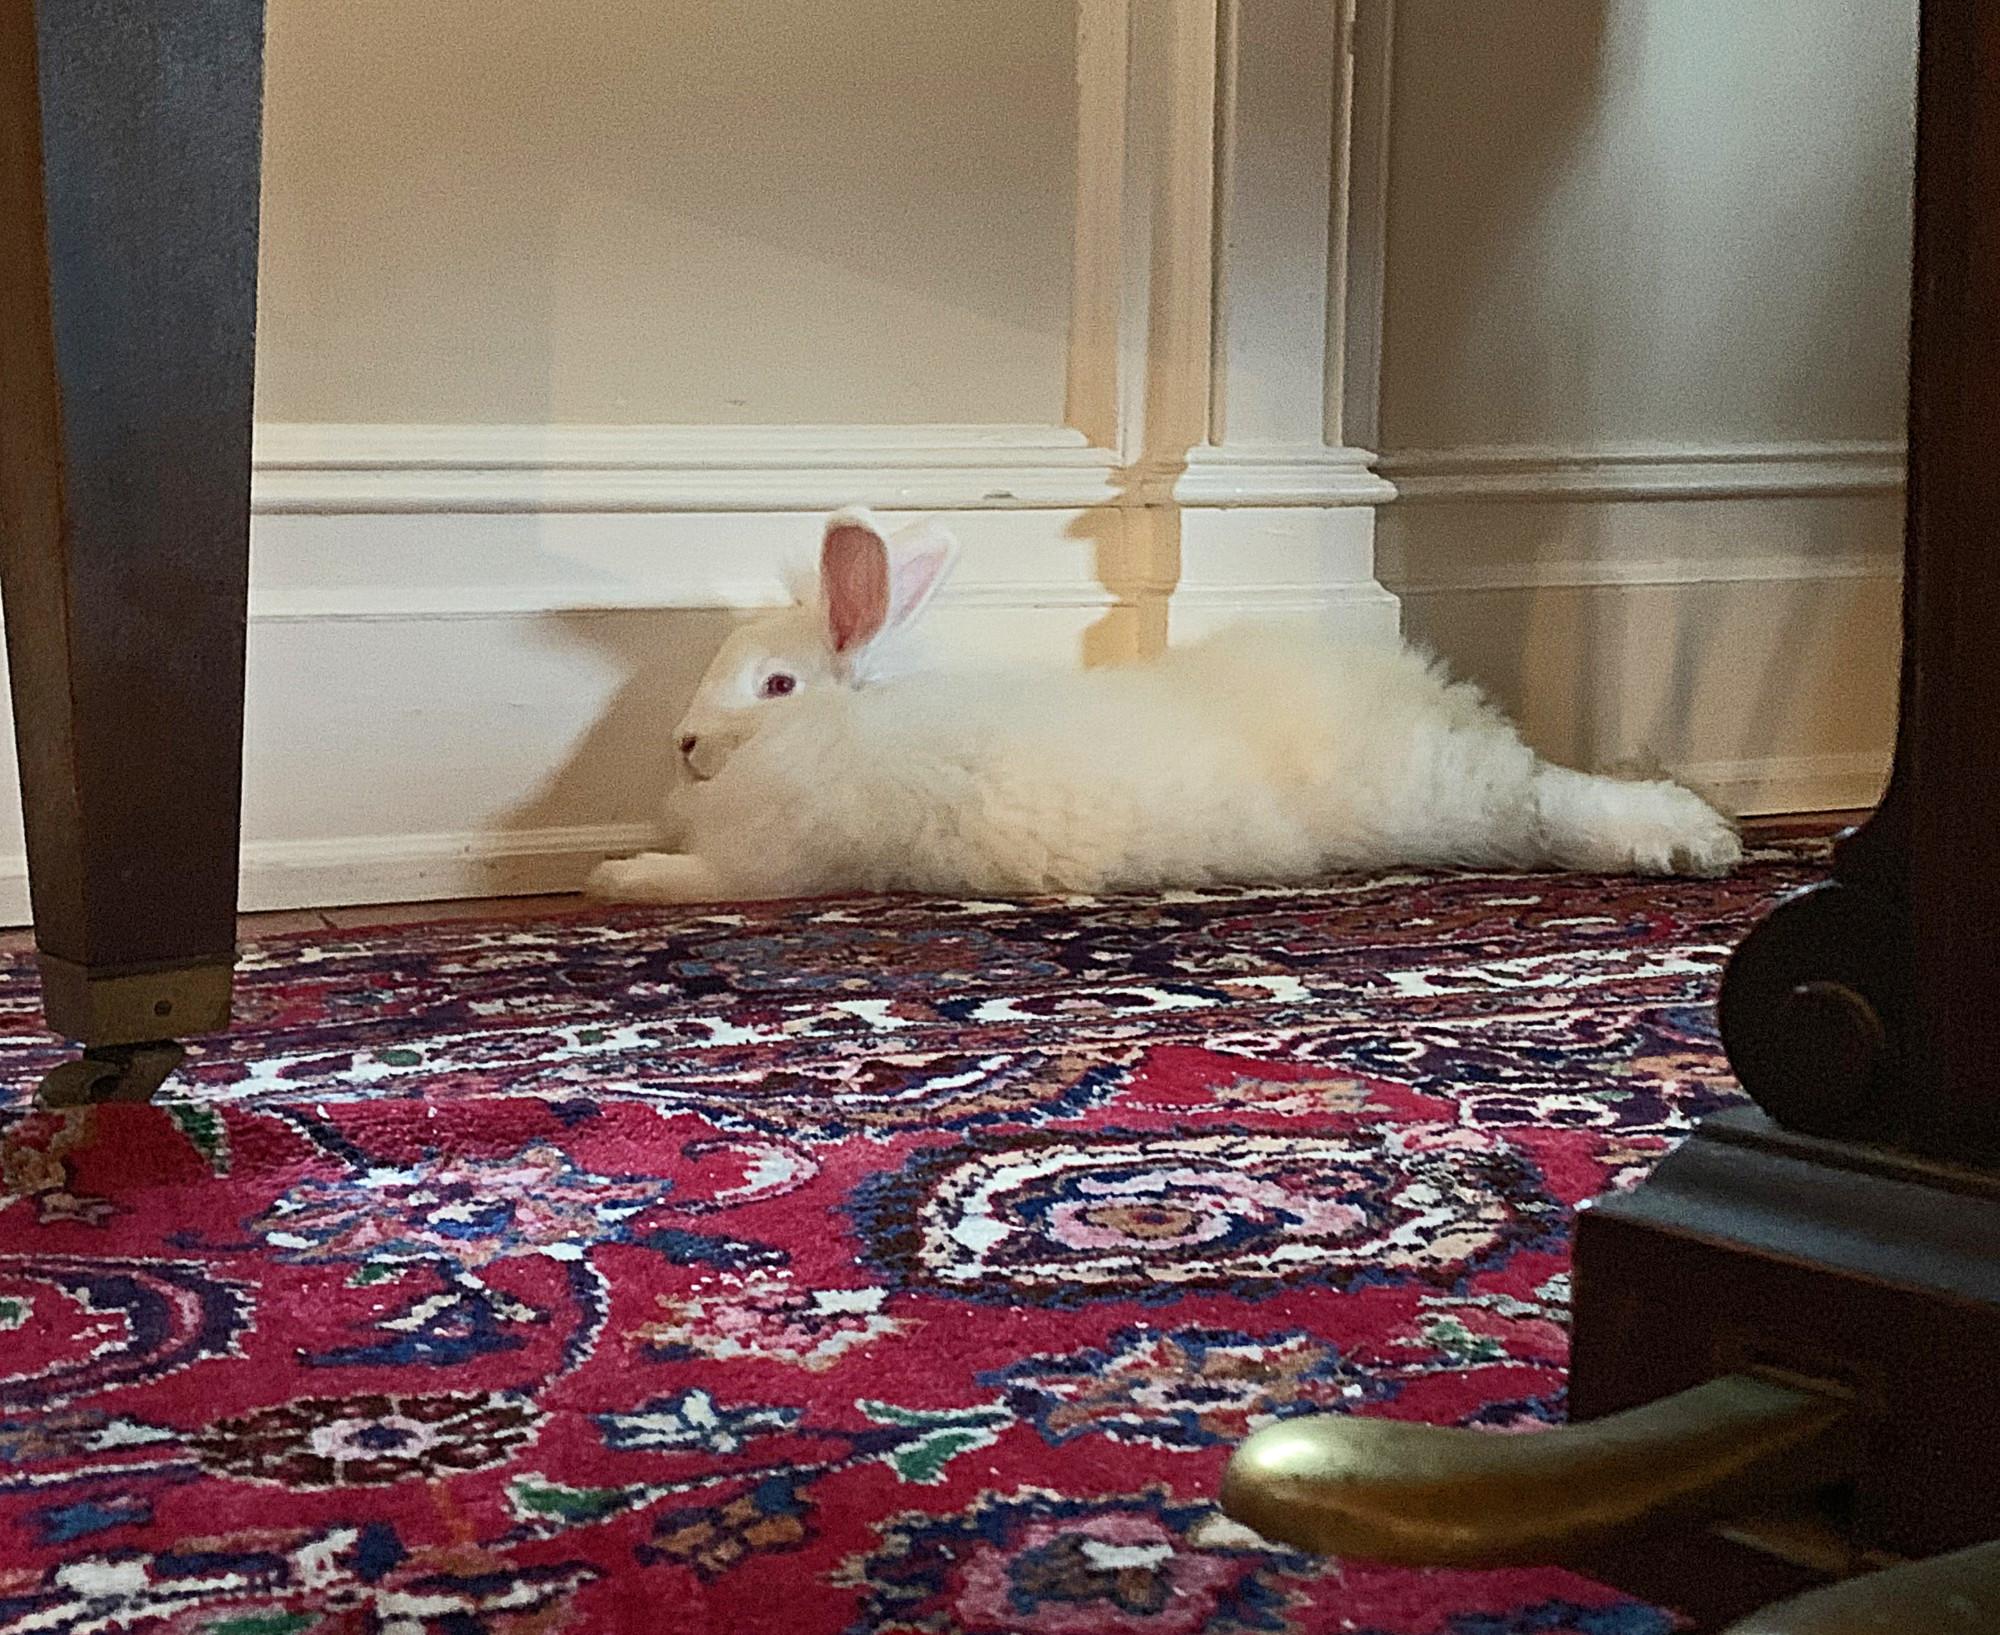 Bunny Under the Piano